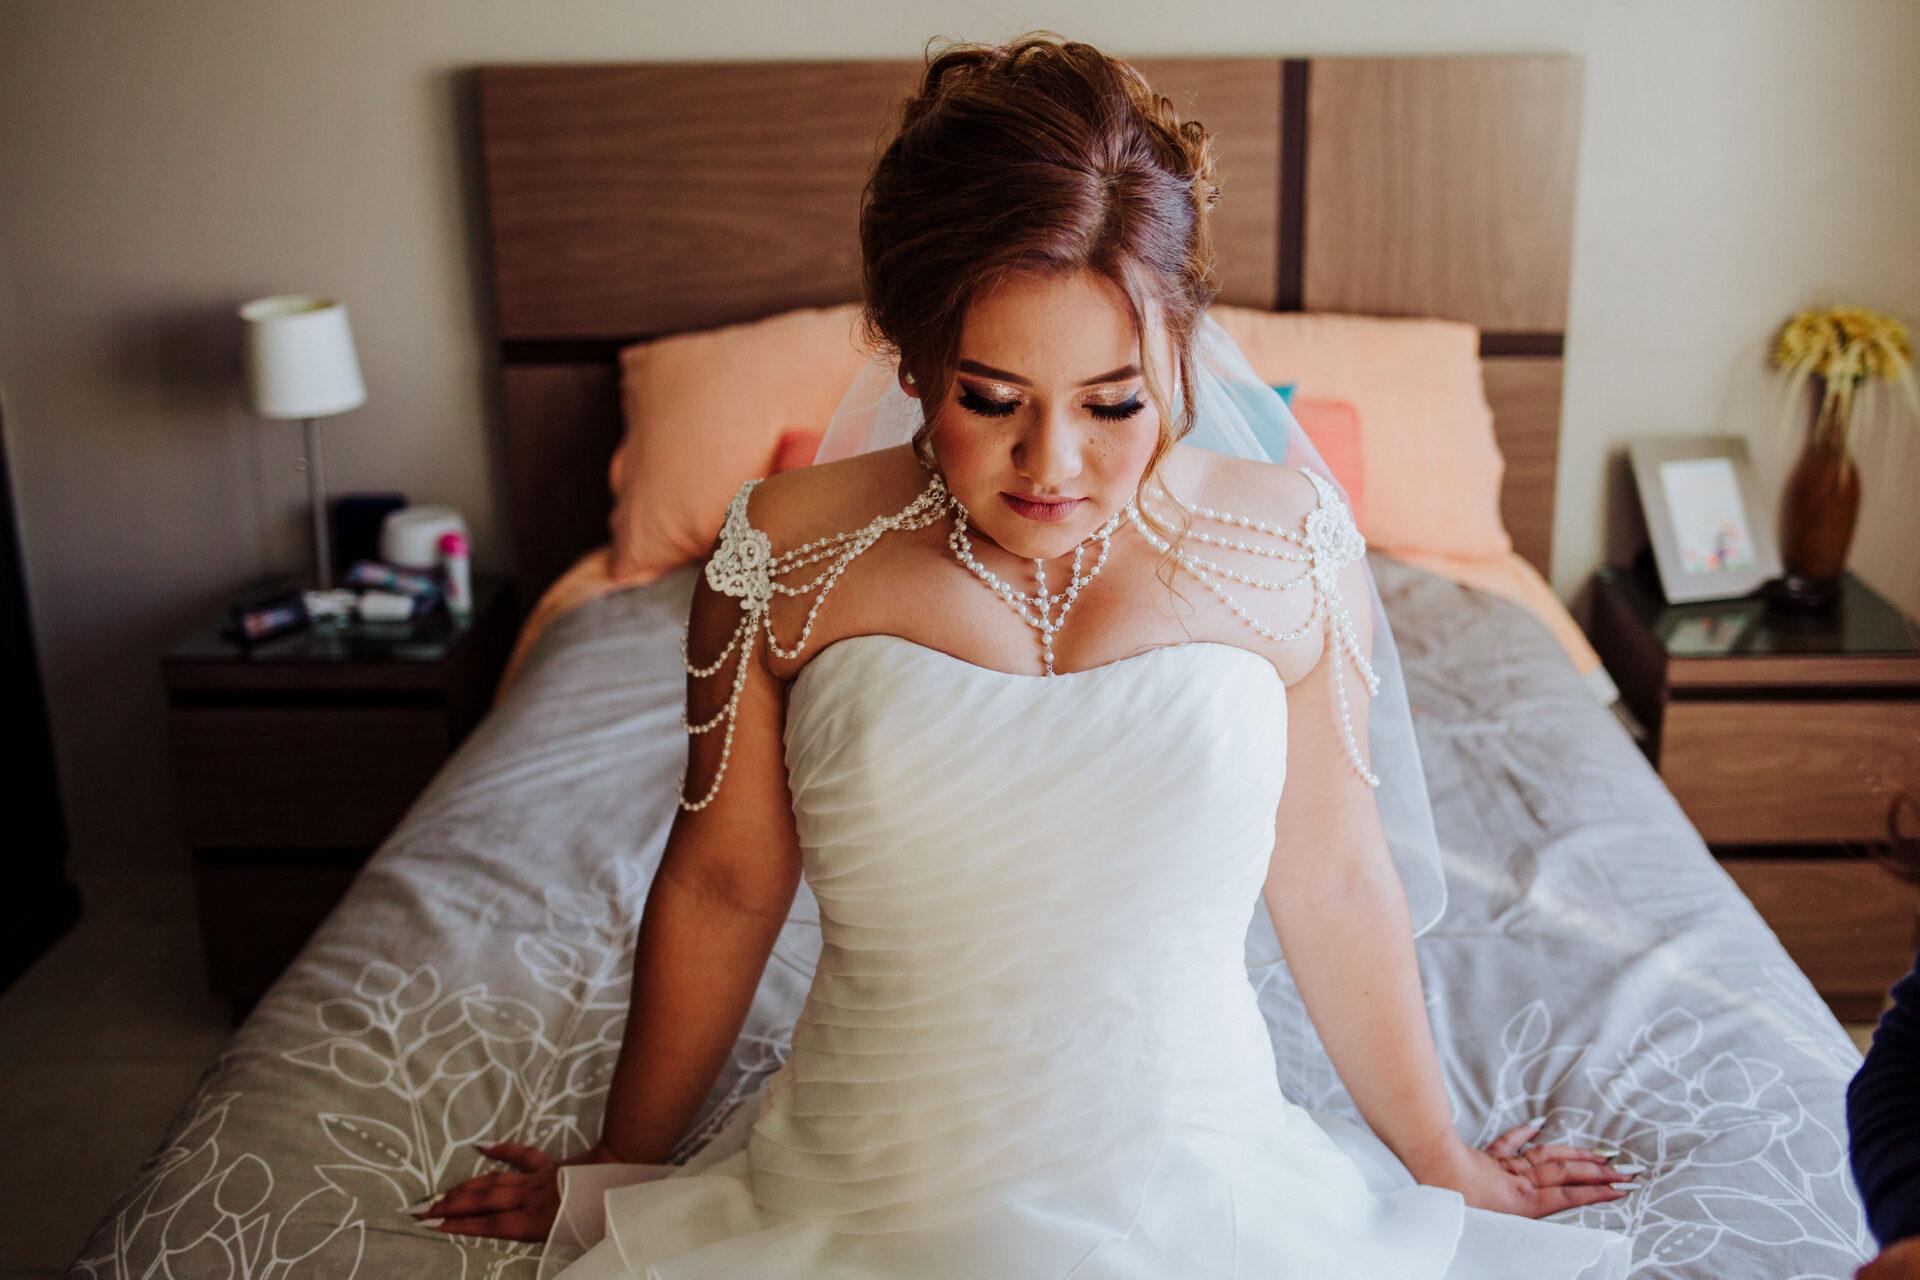 javier_noriega_fotografo_bodas_gaviones_zacatecas_wedding_photographer6